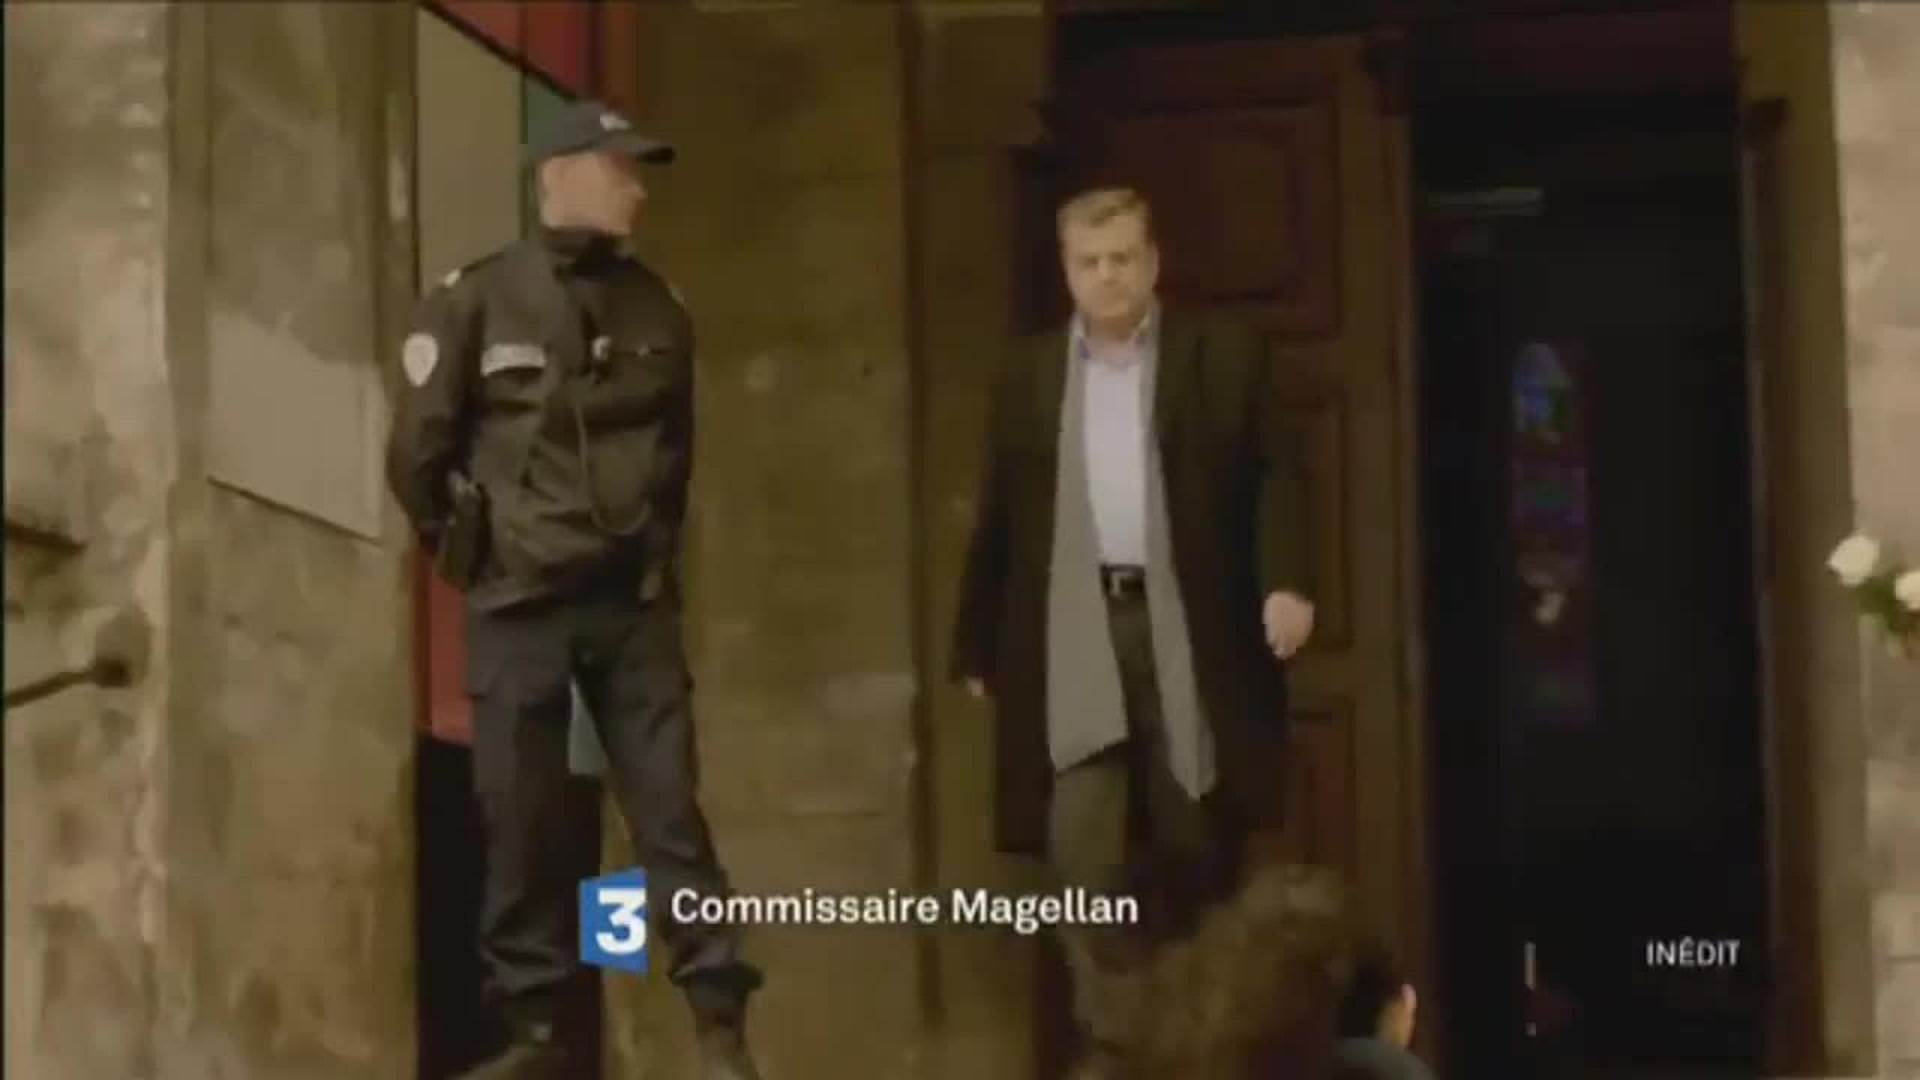 Commissaire Magellan : Chaud devant !